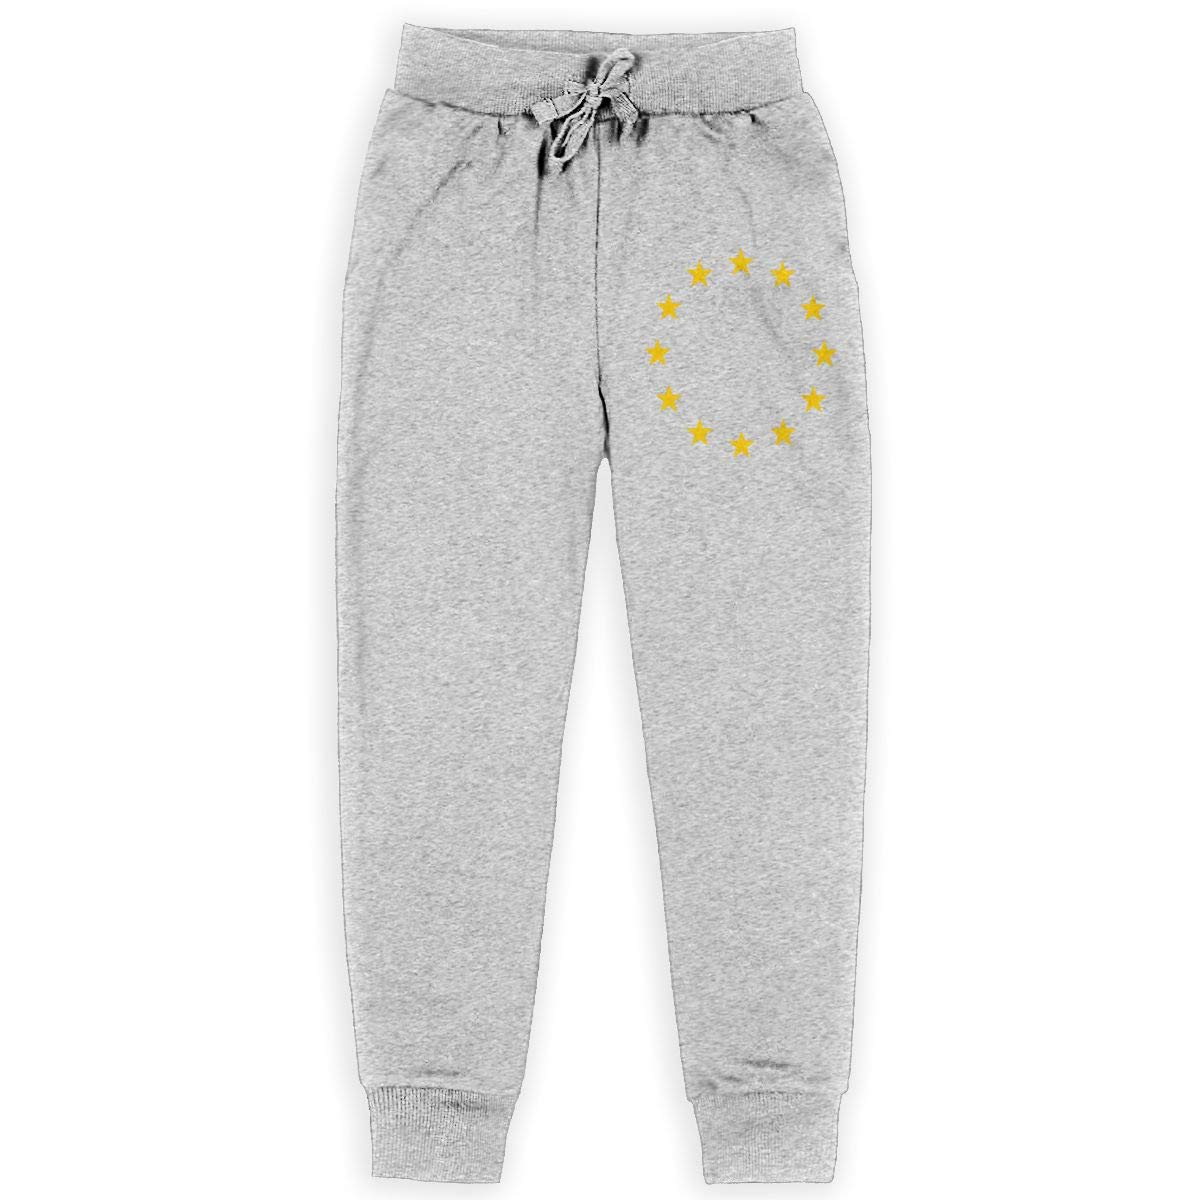 Carrteid EU Flag Boys Fleece Pant Jogger Fleece Pants